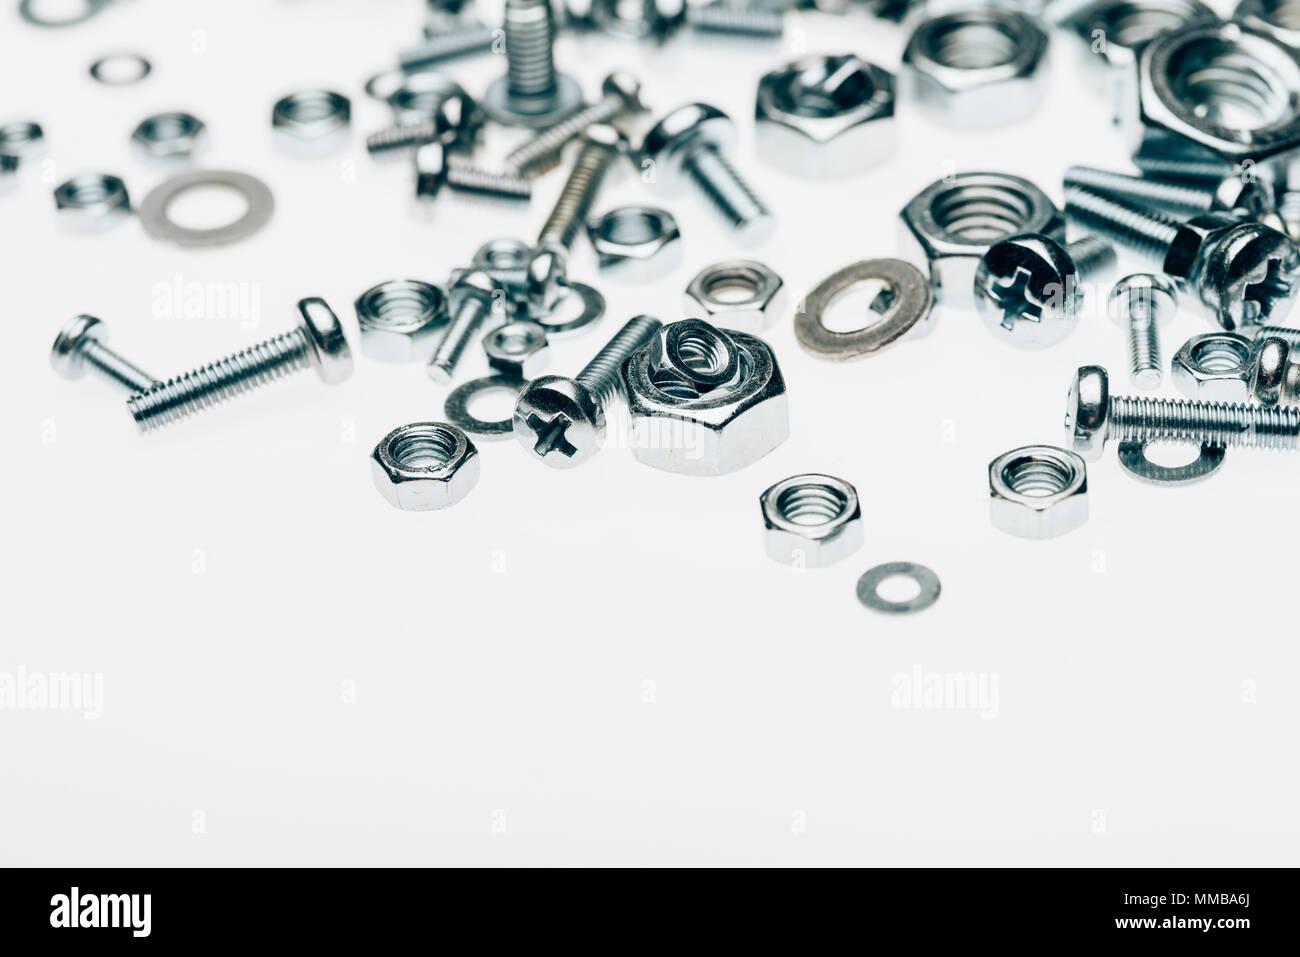 Framing Nails Stock Photos & Framing Nails Stock Images - Alamy